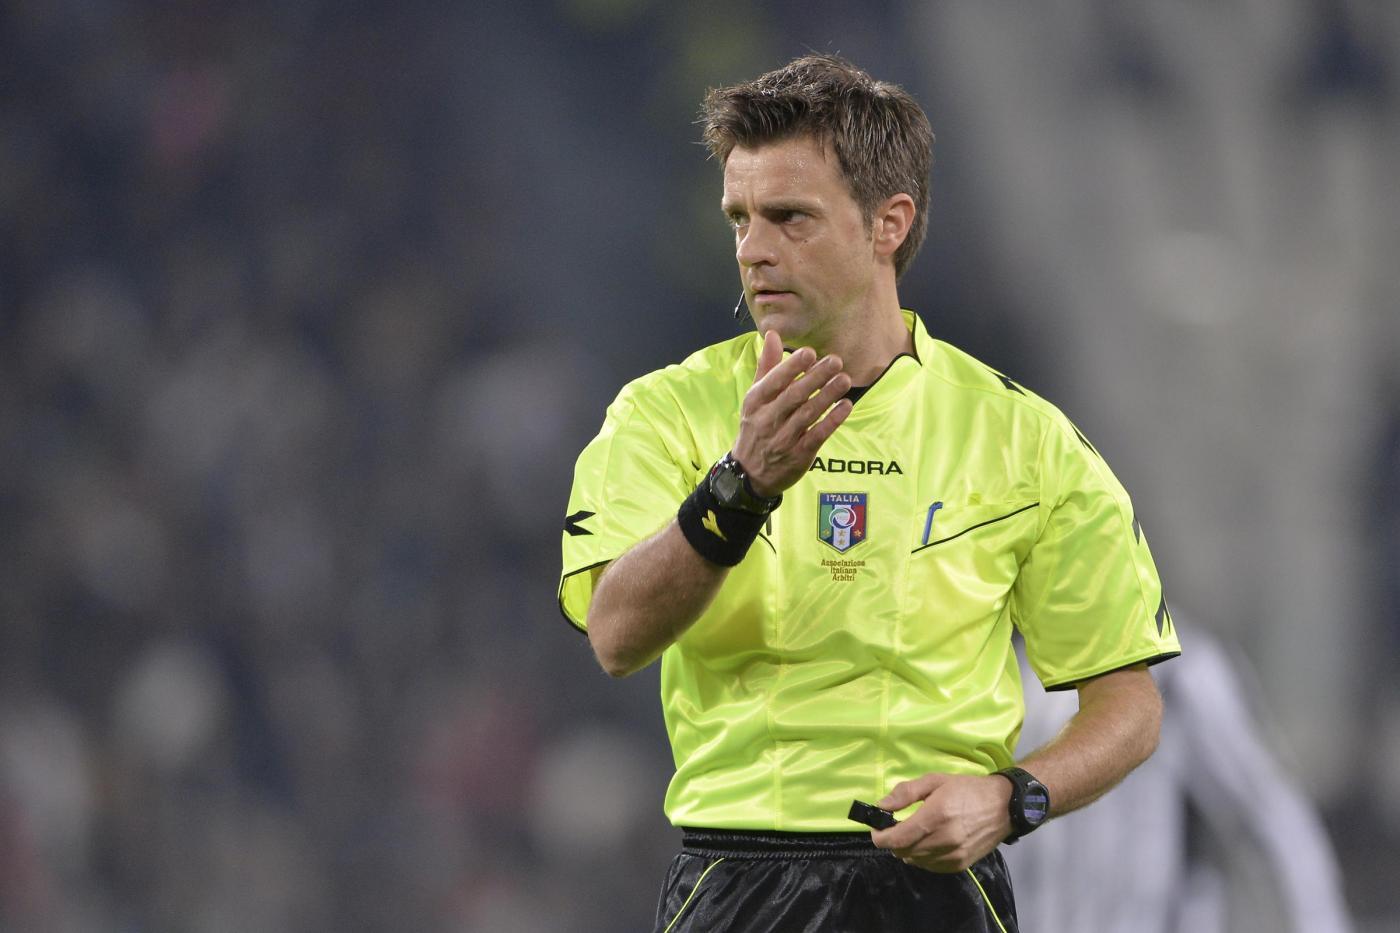 Rizzoli infortunato salta Juve-Napoli